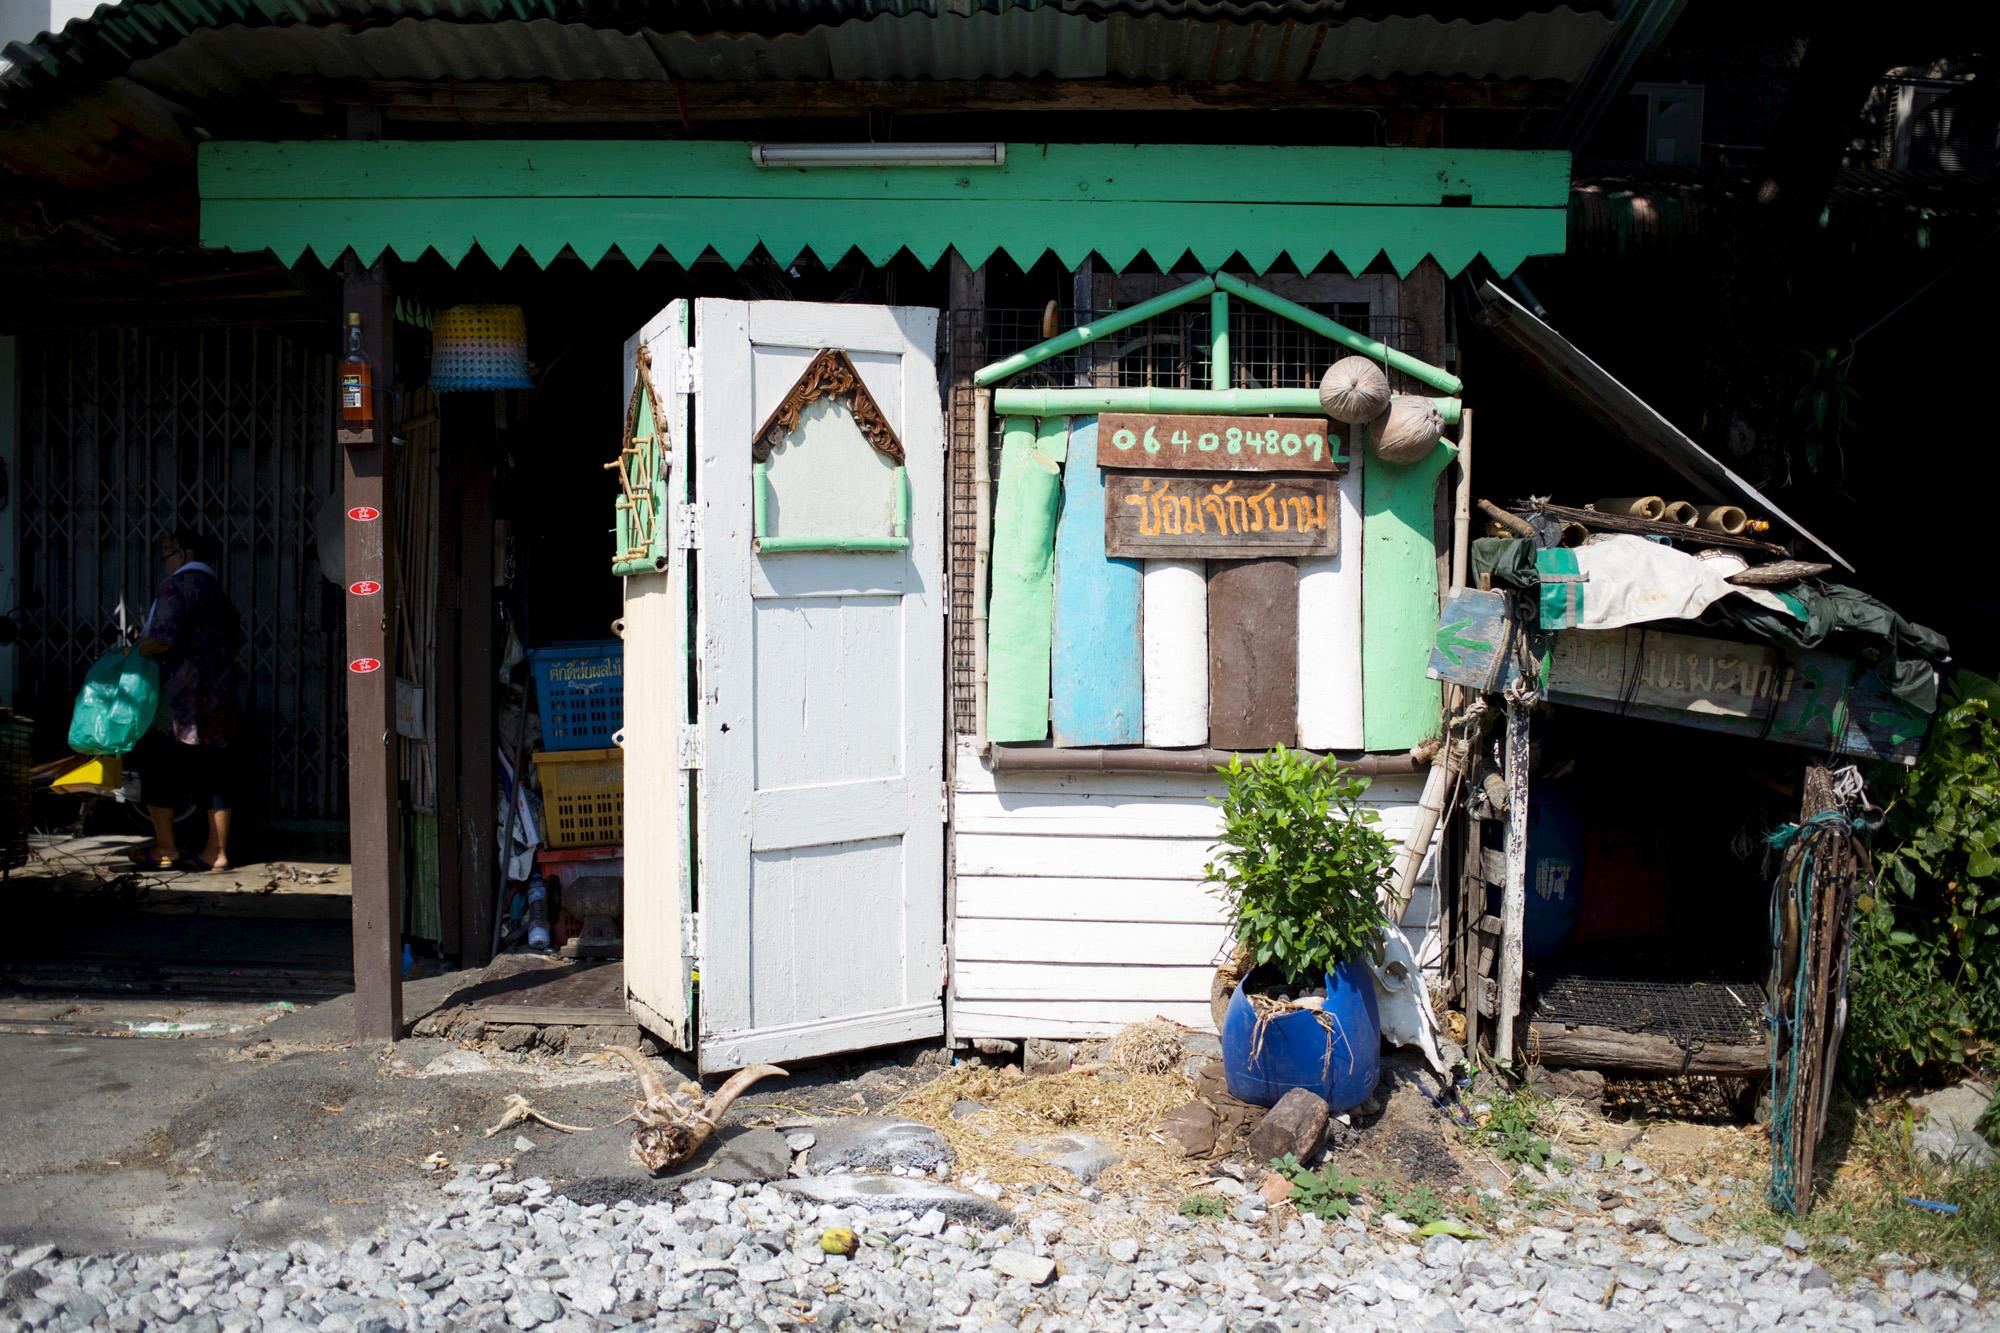 green hut near railway line